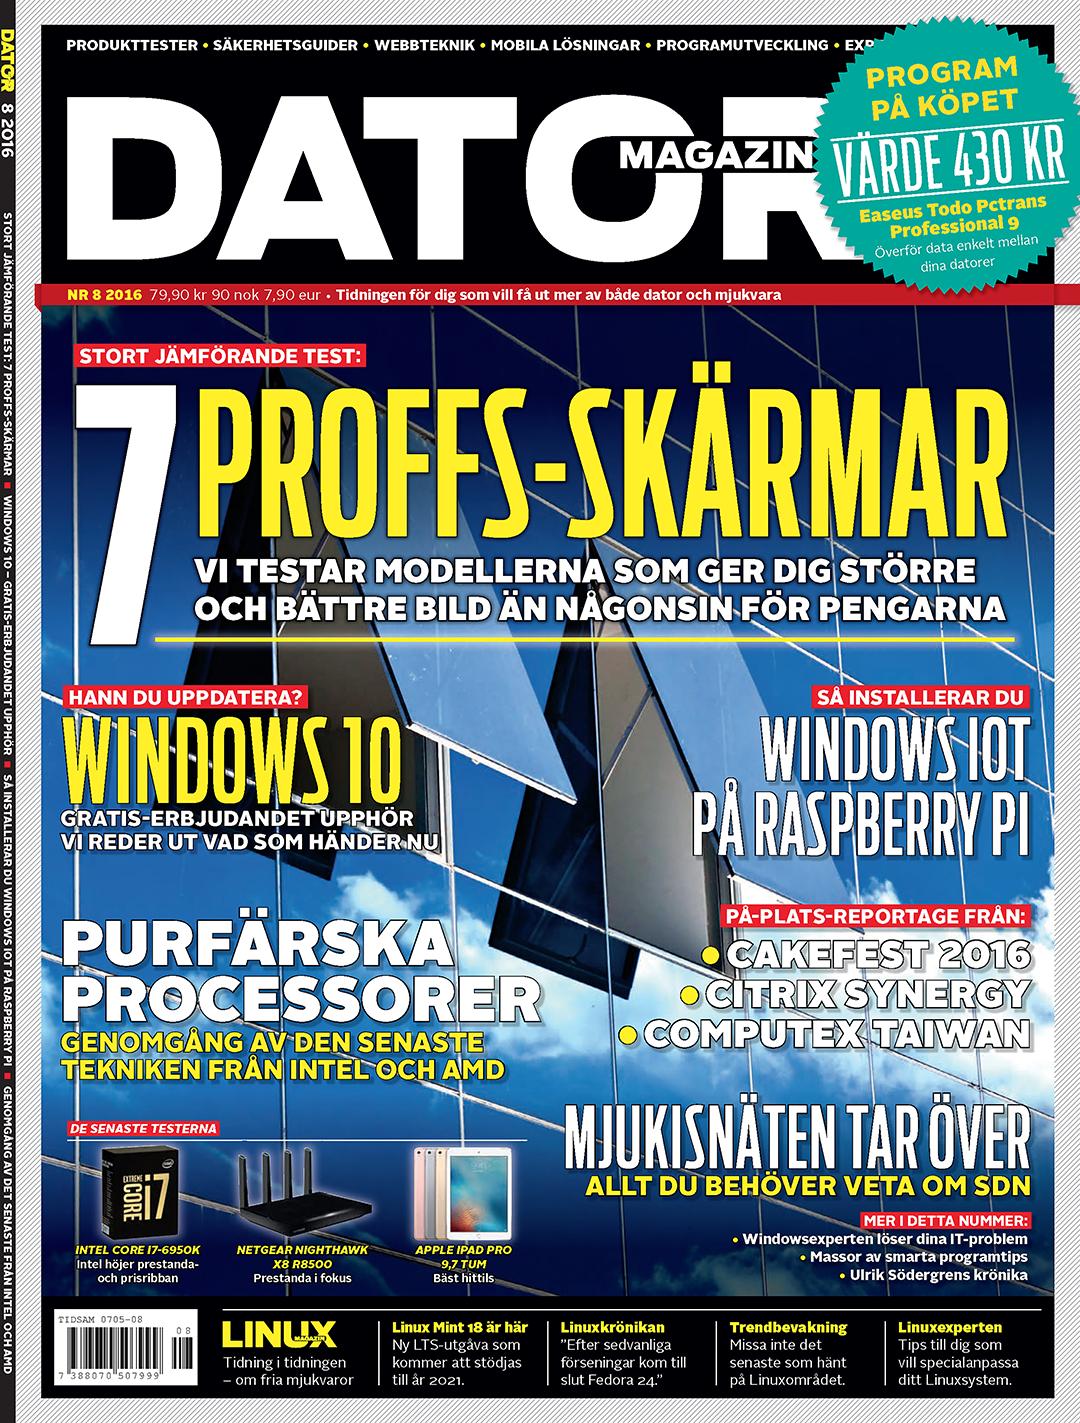 Datormagazin-8-2016_omslag